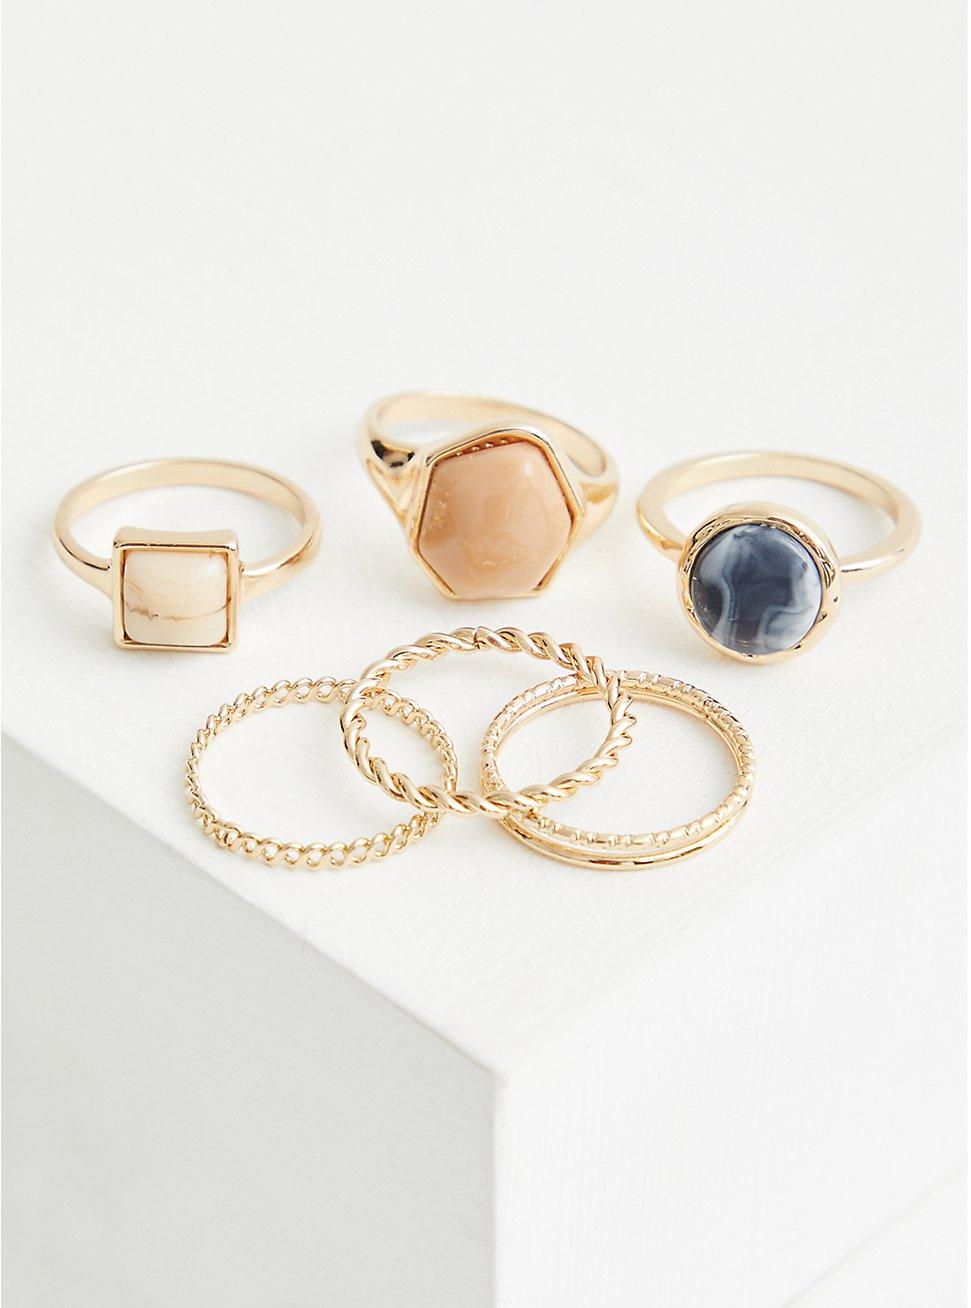 Blue & Faux Natural Stone Ring Set of 6 - Gold Tone , MULTI, hi-res